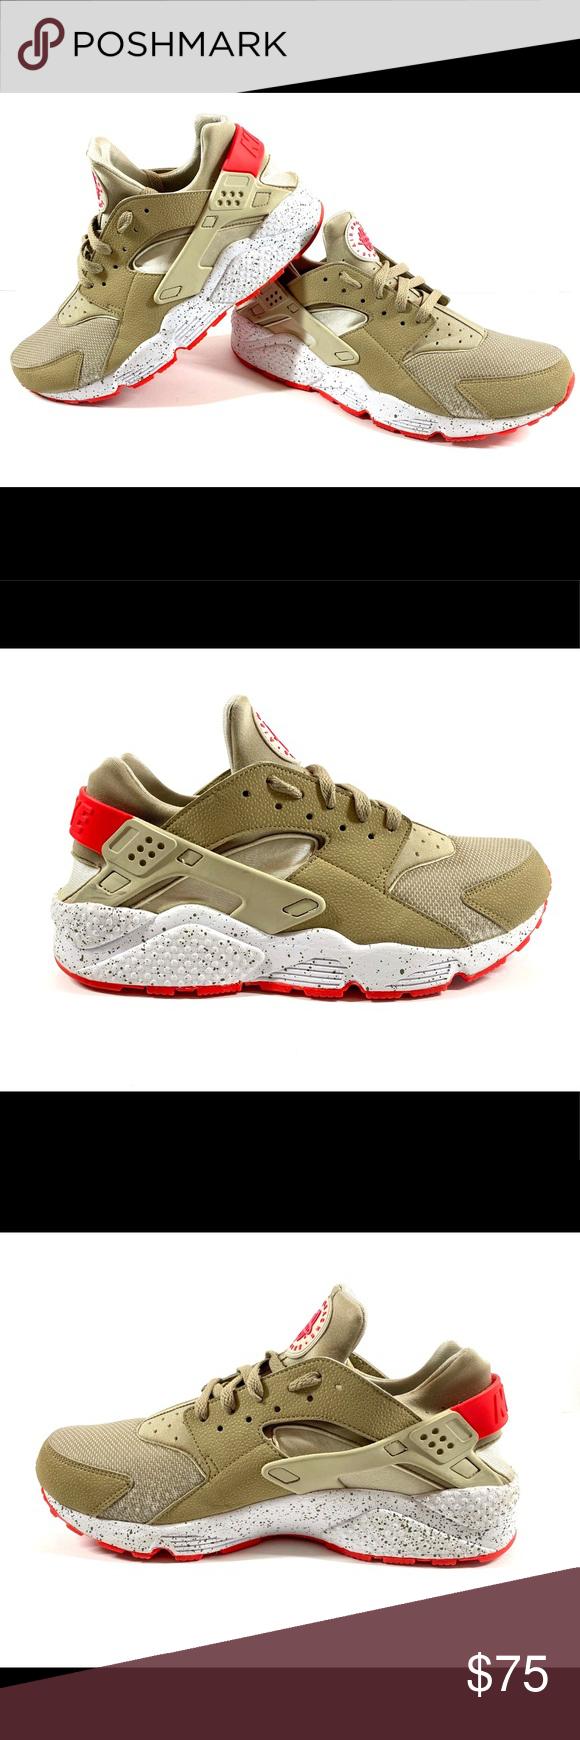 Nike Air Huarache Beige Laser Crimson 11 5 Us Mens Shoes In Excellent Condition Light Wear Please See Photos Size Nike Air Huarache Huaraches Air Huarache